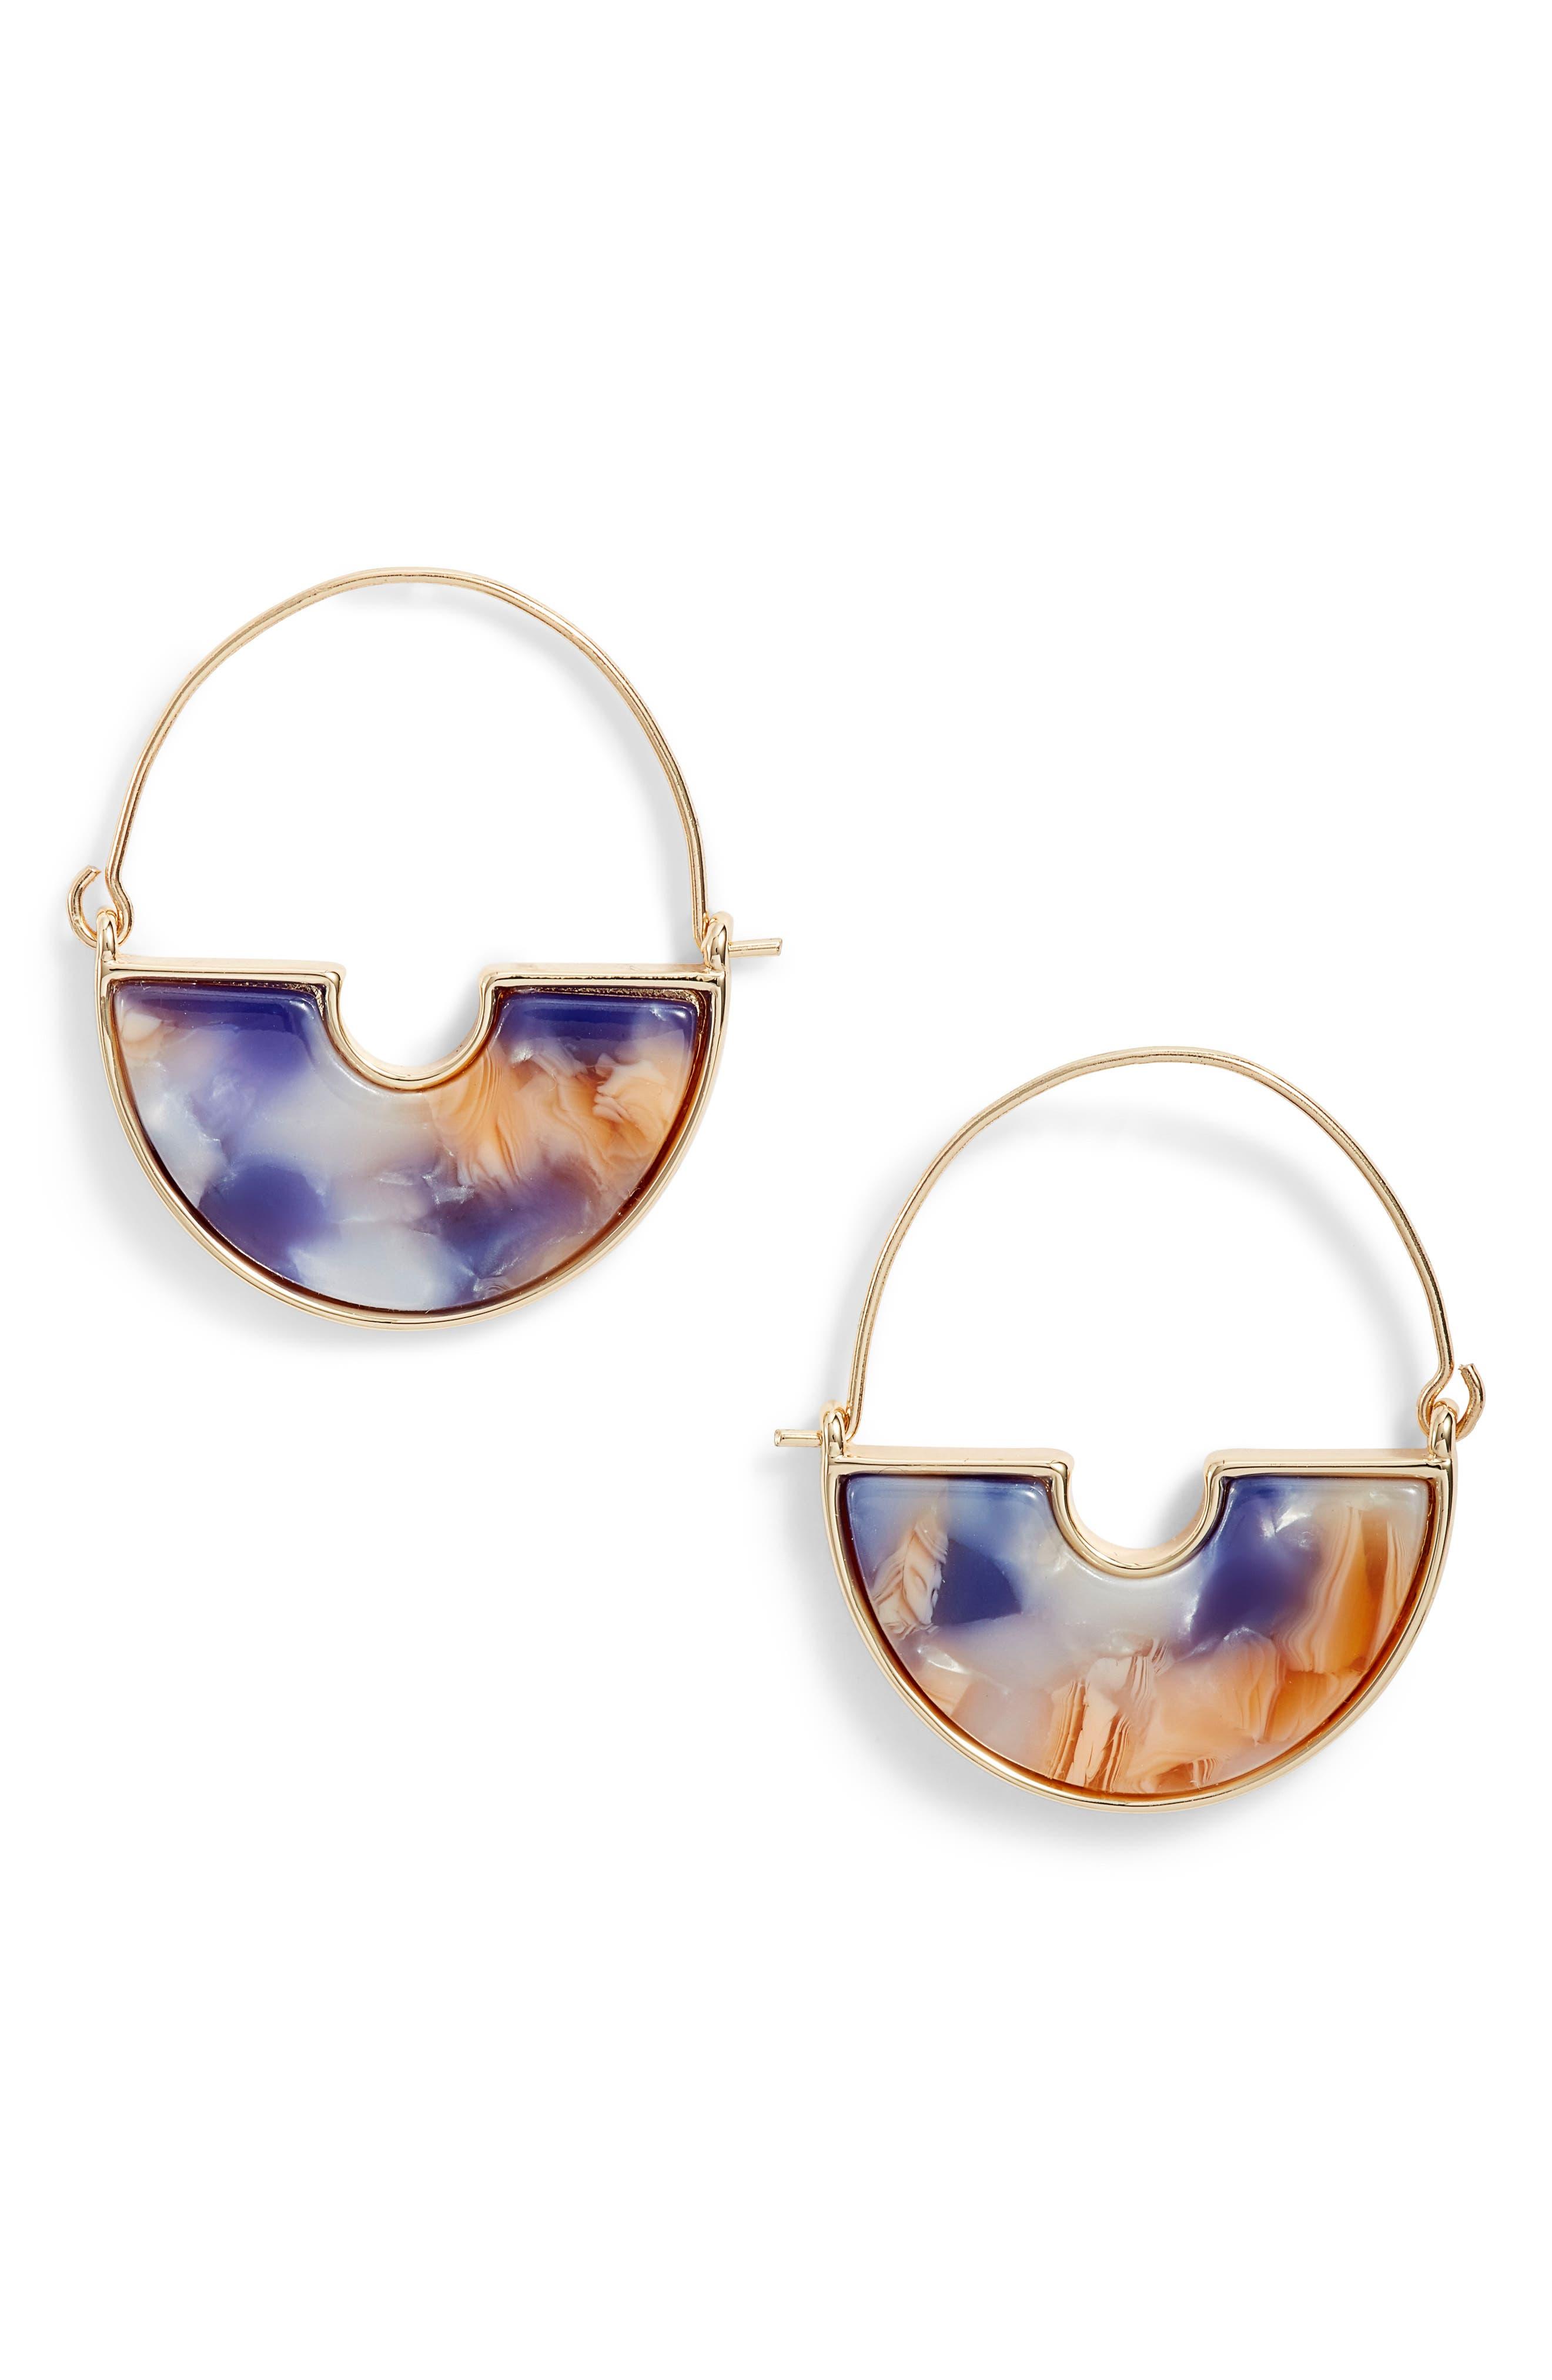 Resin Crescent Hoop Earrings,                             Main thumbnail 1, color,                             510